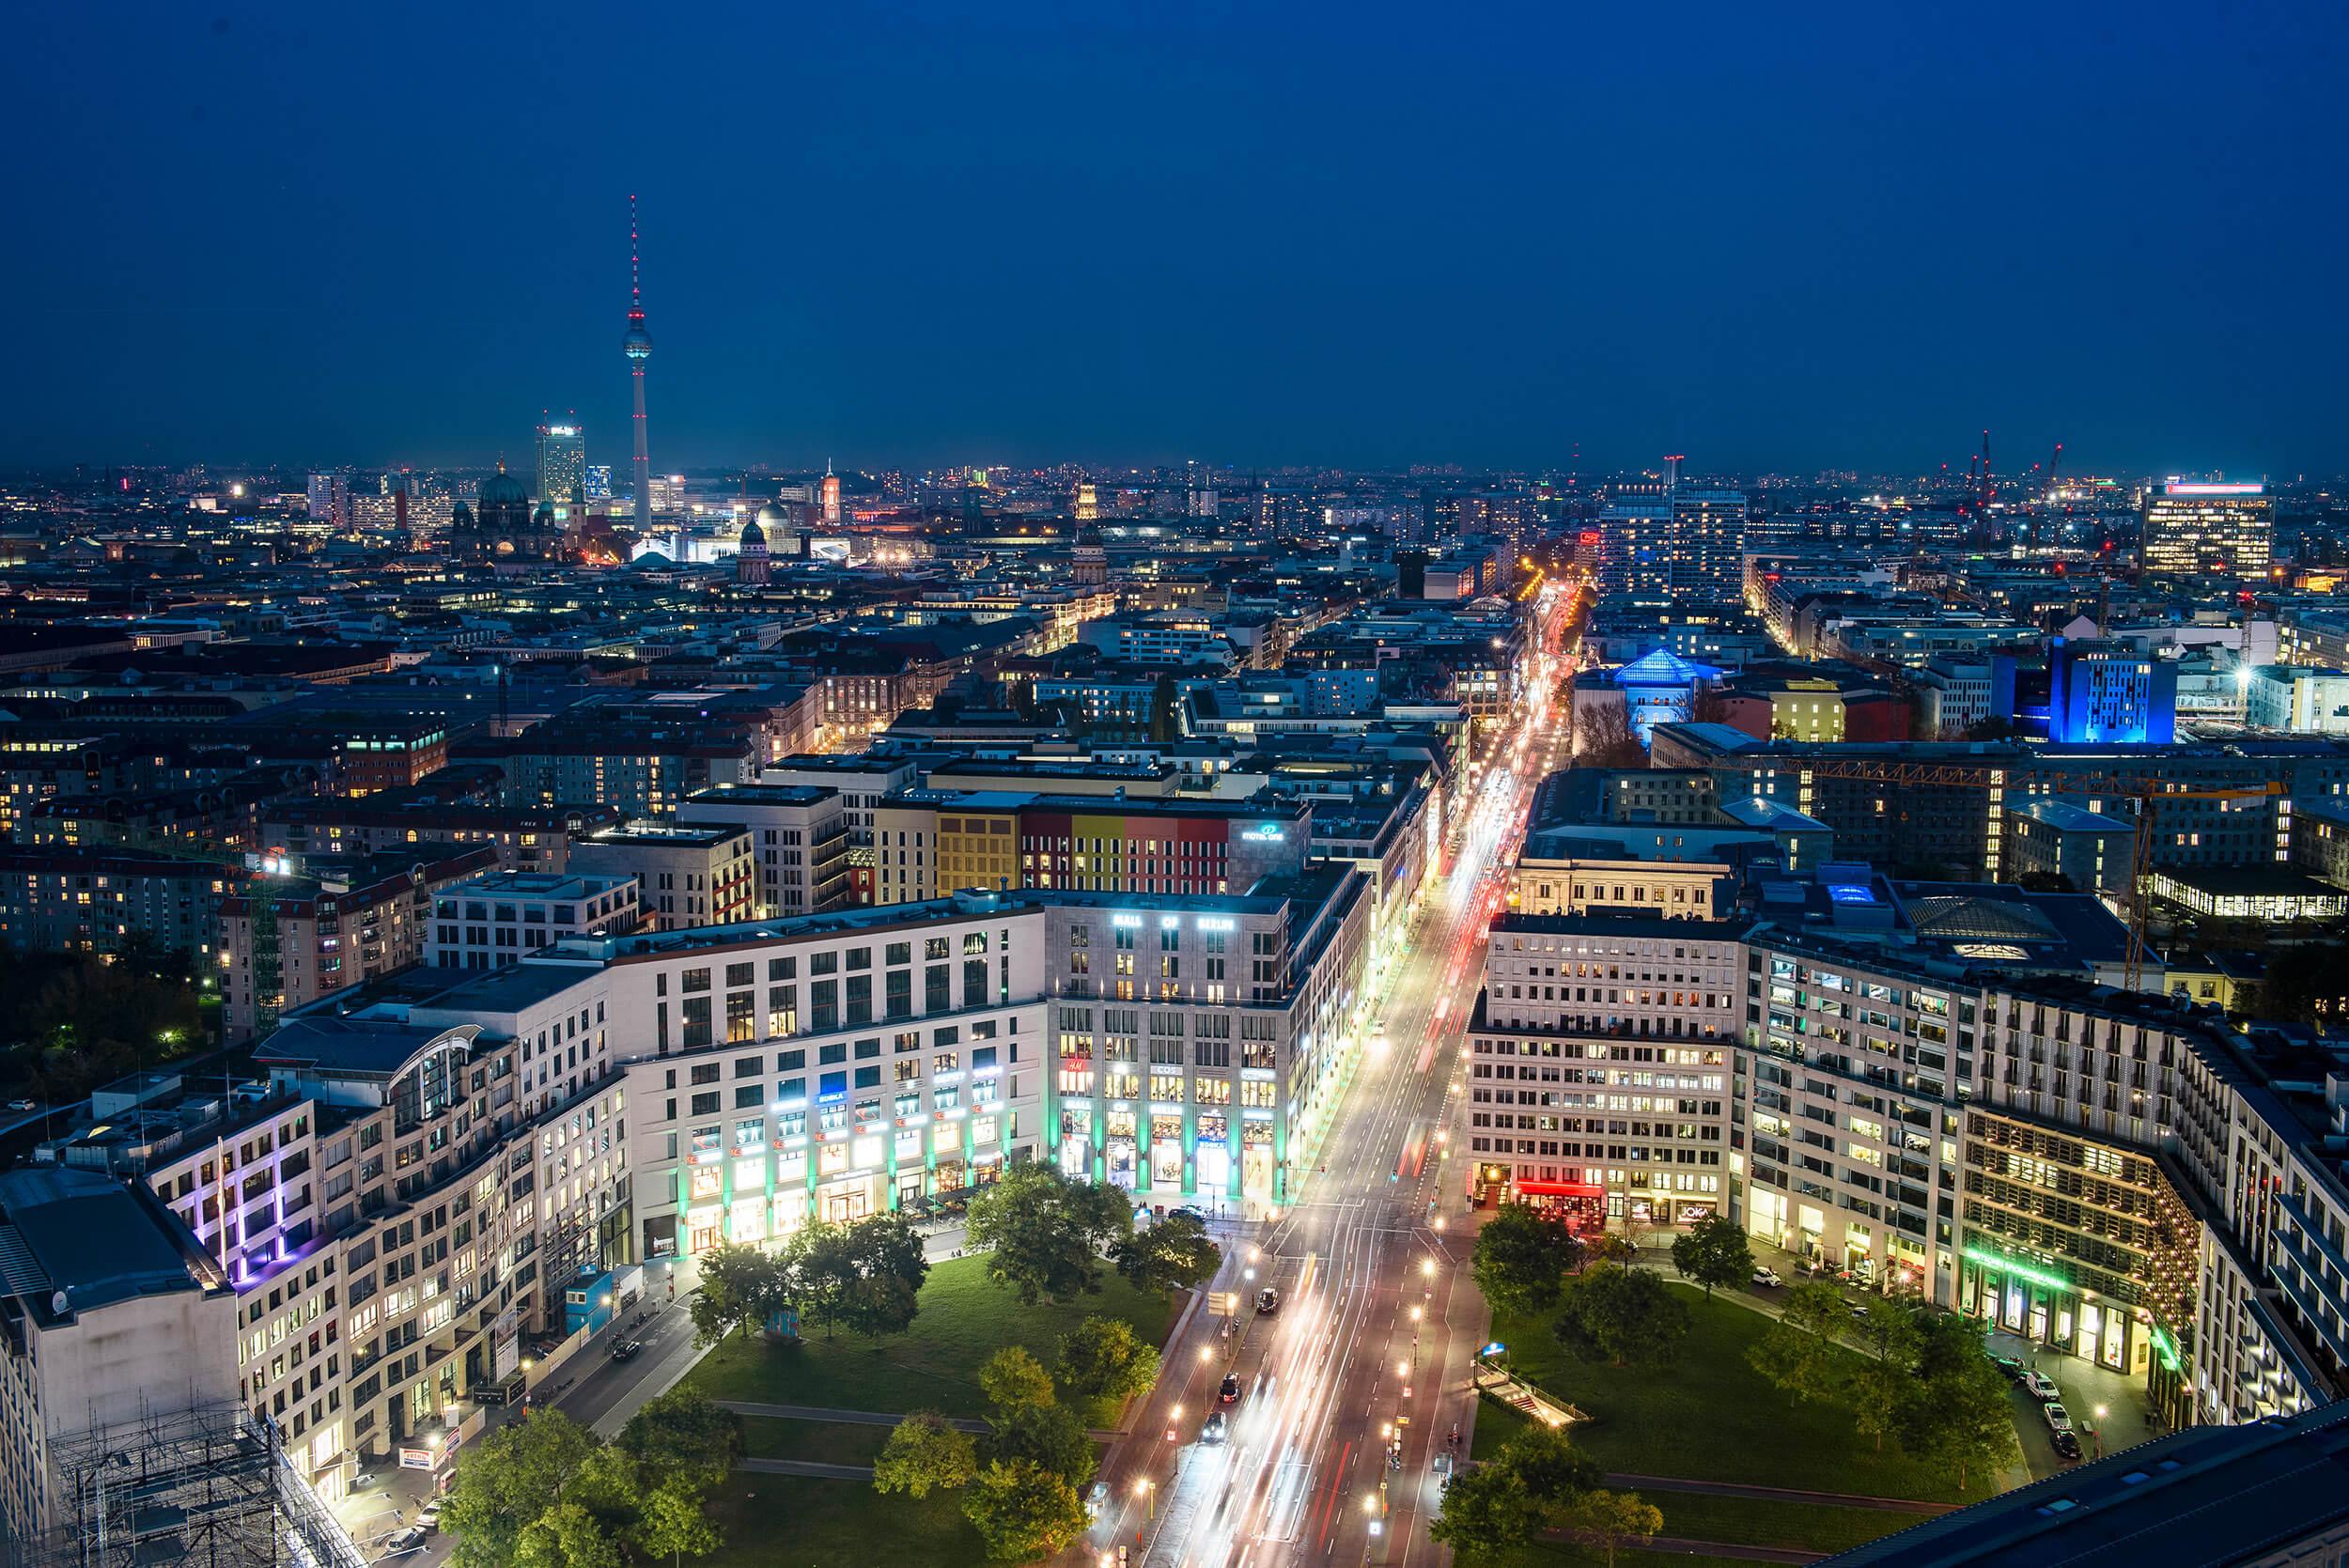 Ausblick vom Potsdamer Platz